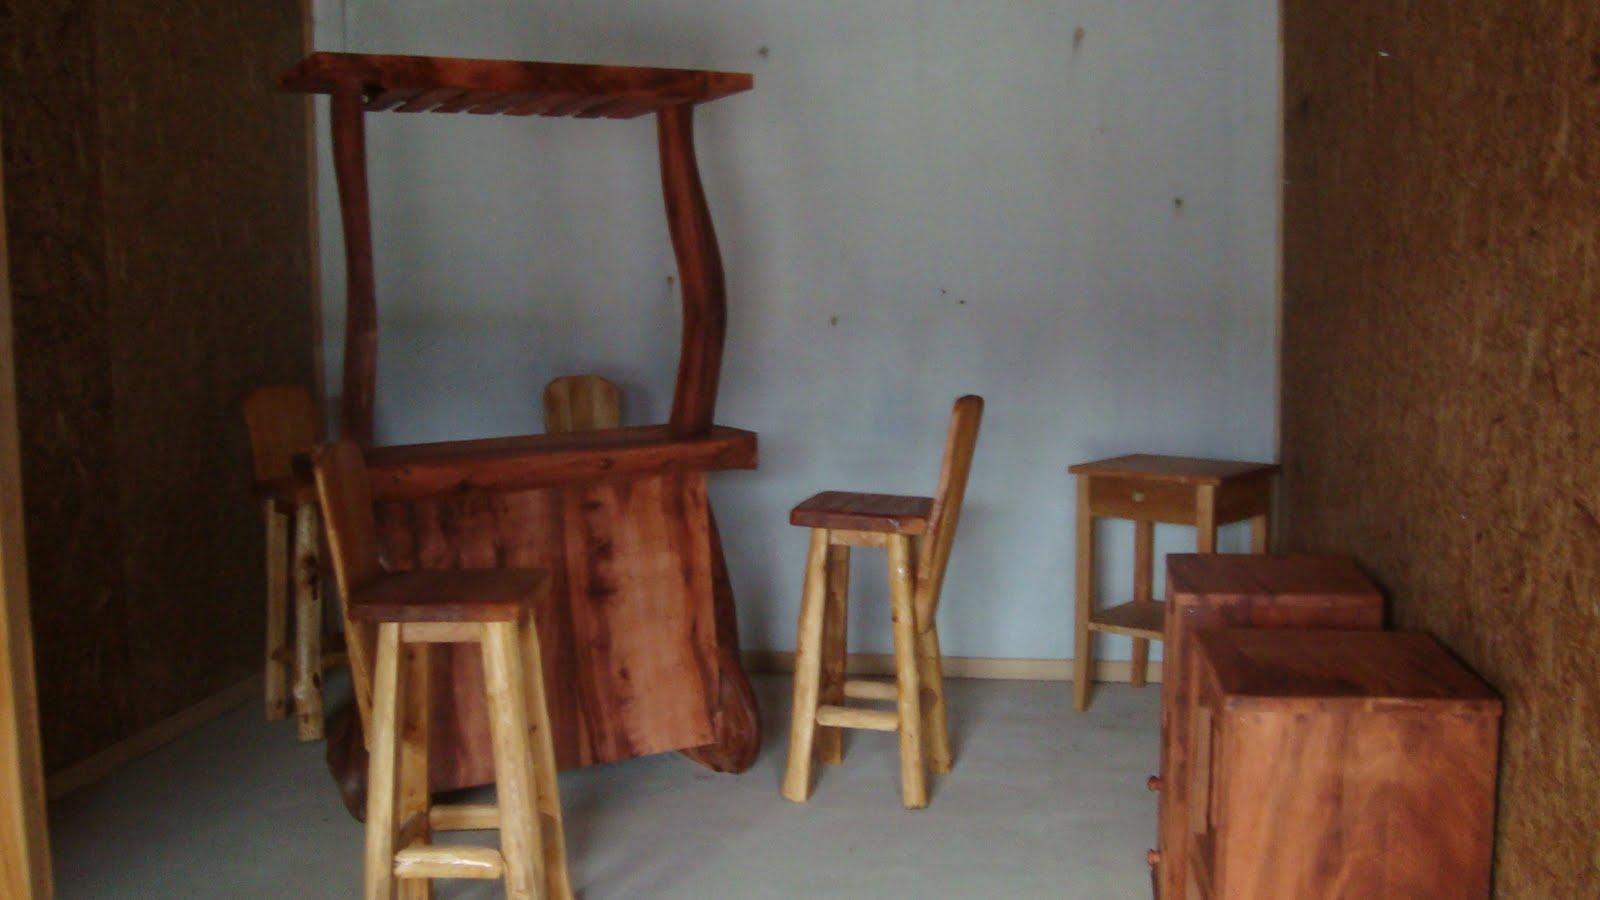 Artesanos de alerce historico comite de artesanos de alerce historico Artesanias en madera